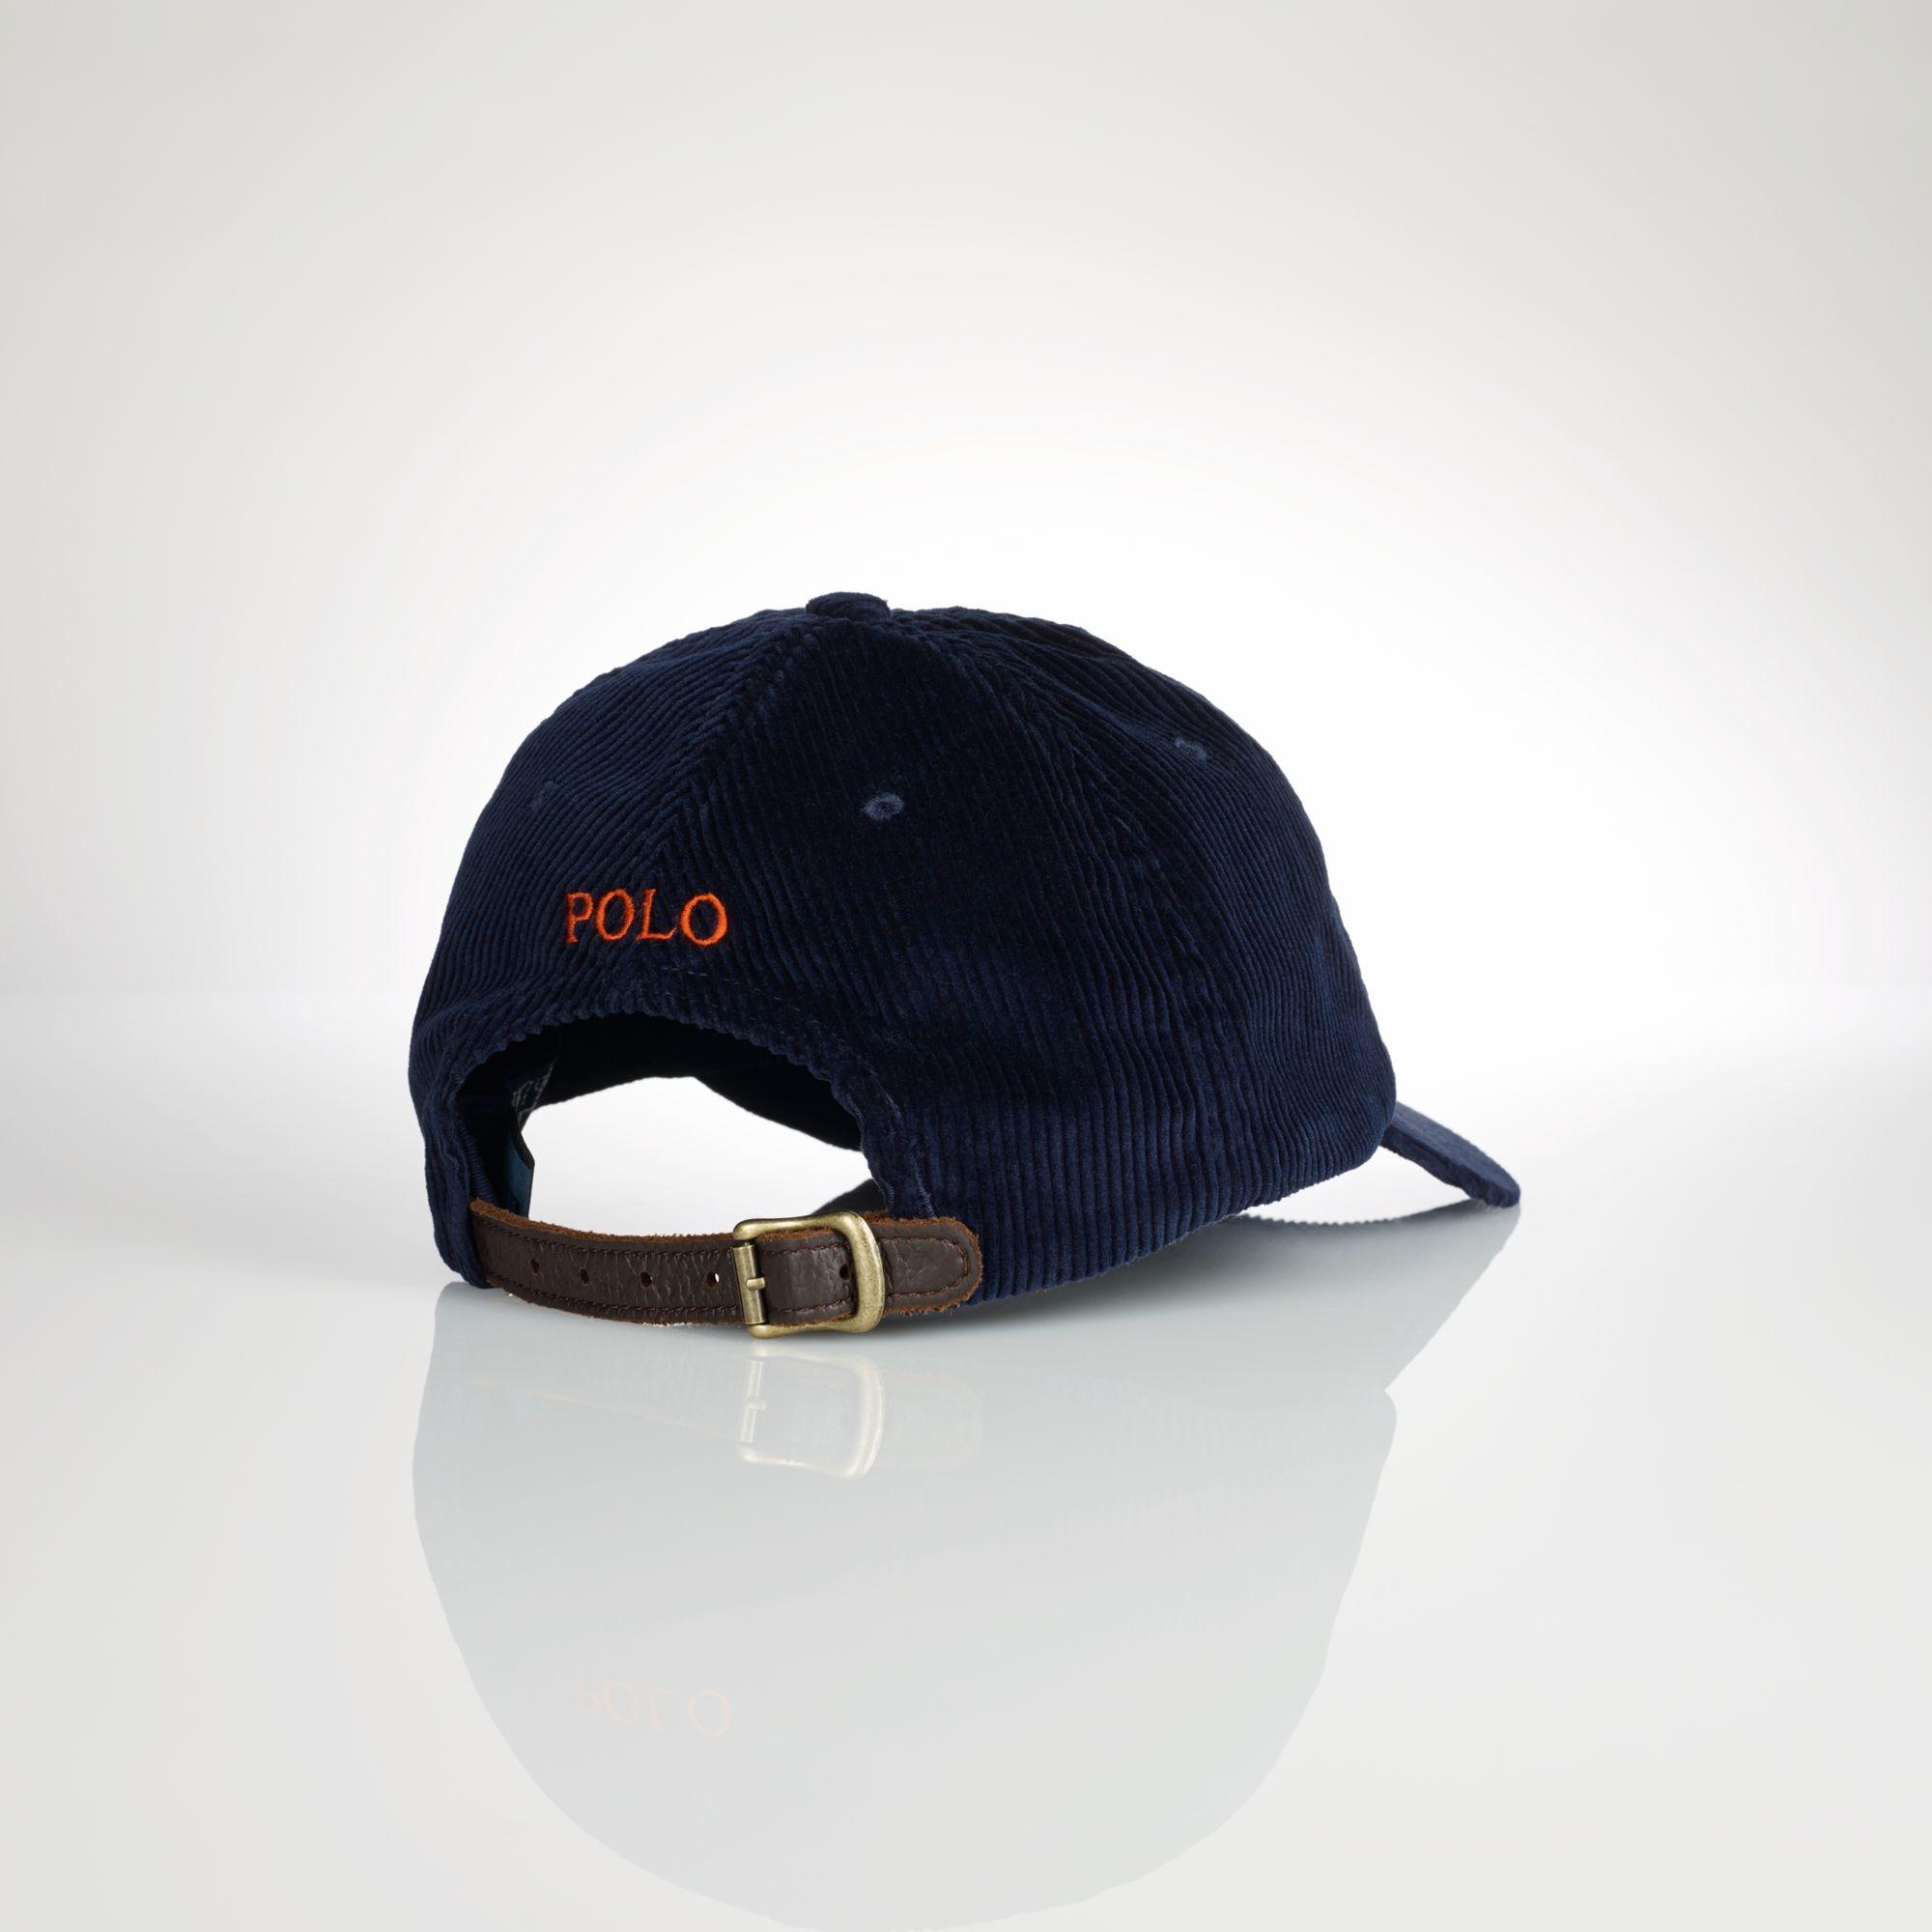 polo ralph lauren corduroy sports cap in blue for men lyst. Black Bedroom Furniture Sets. Home Design Ideas